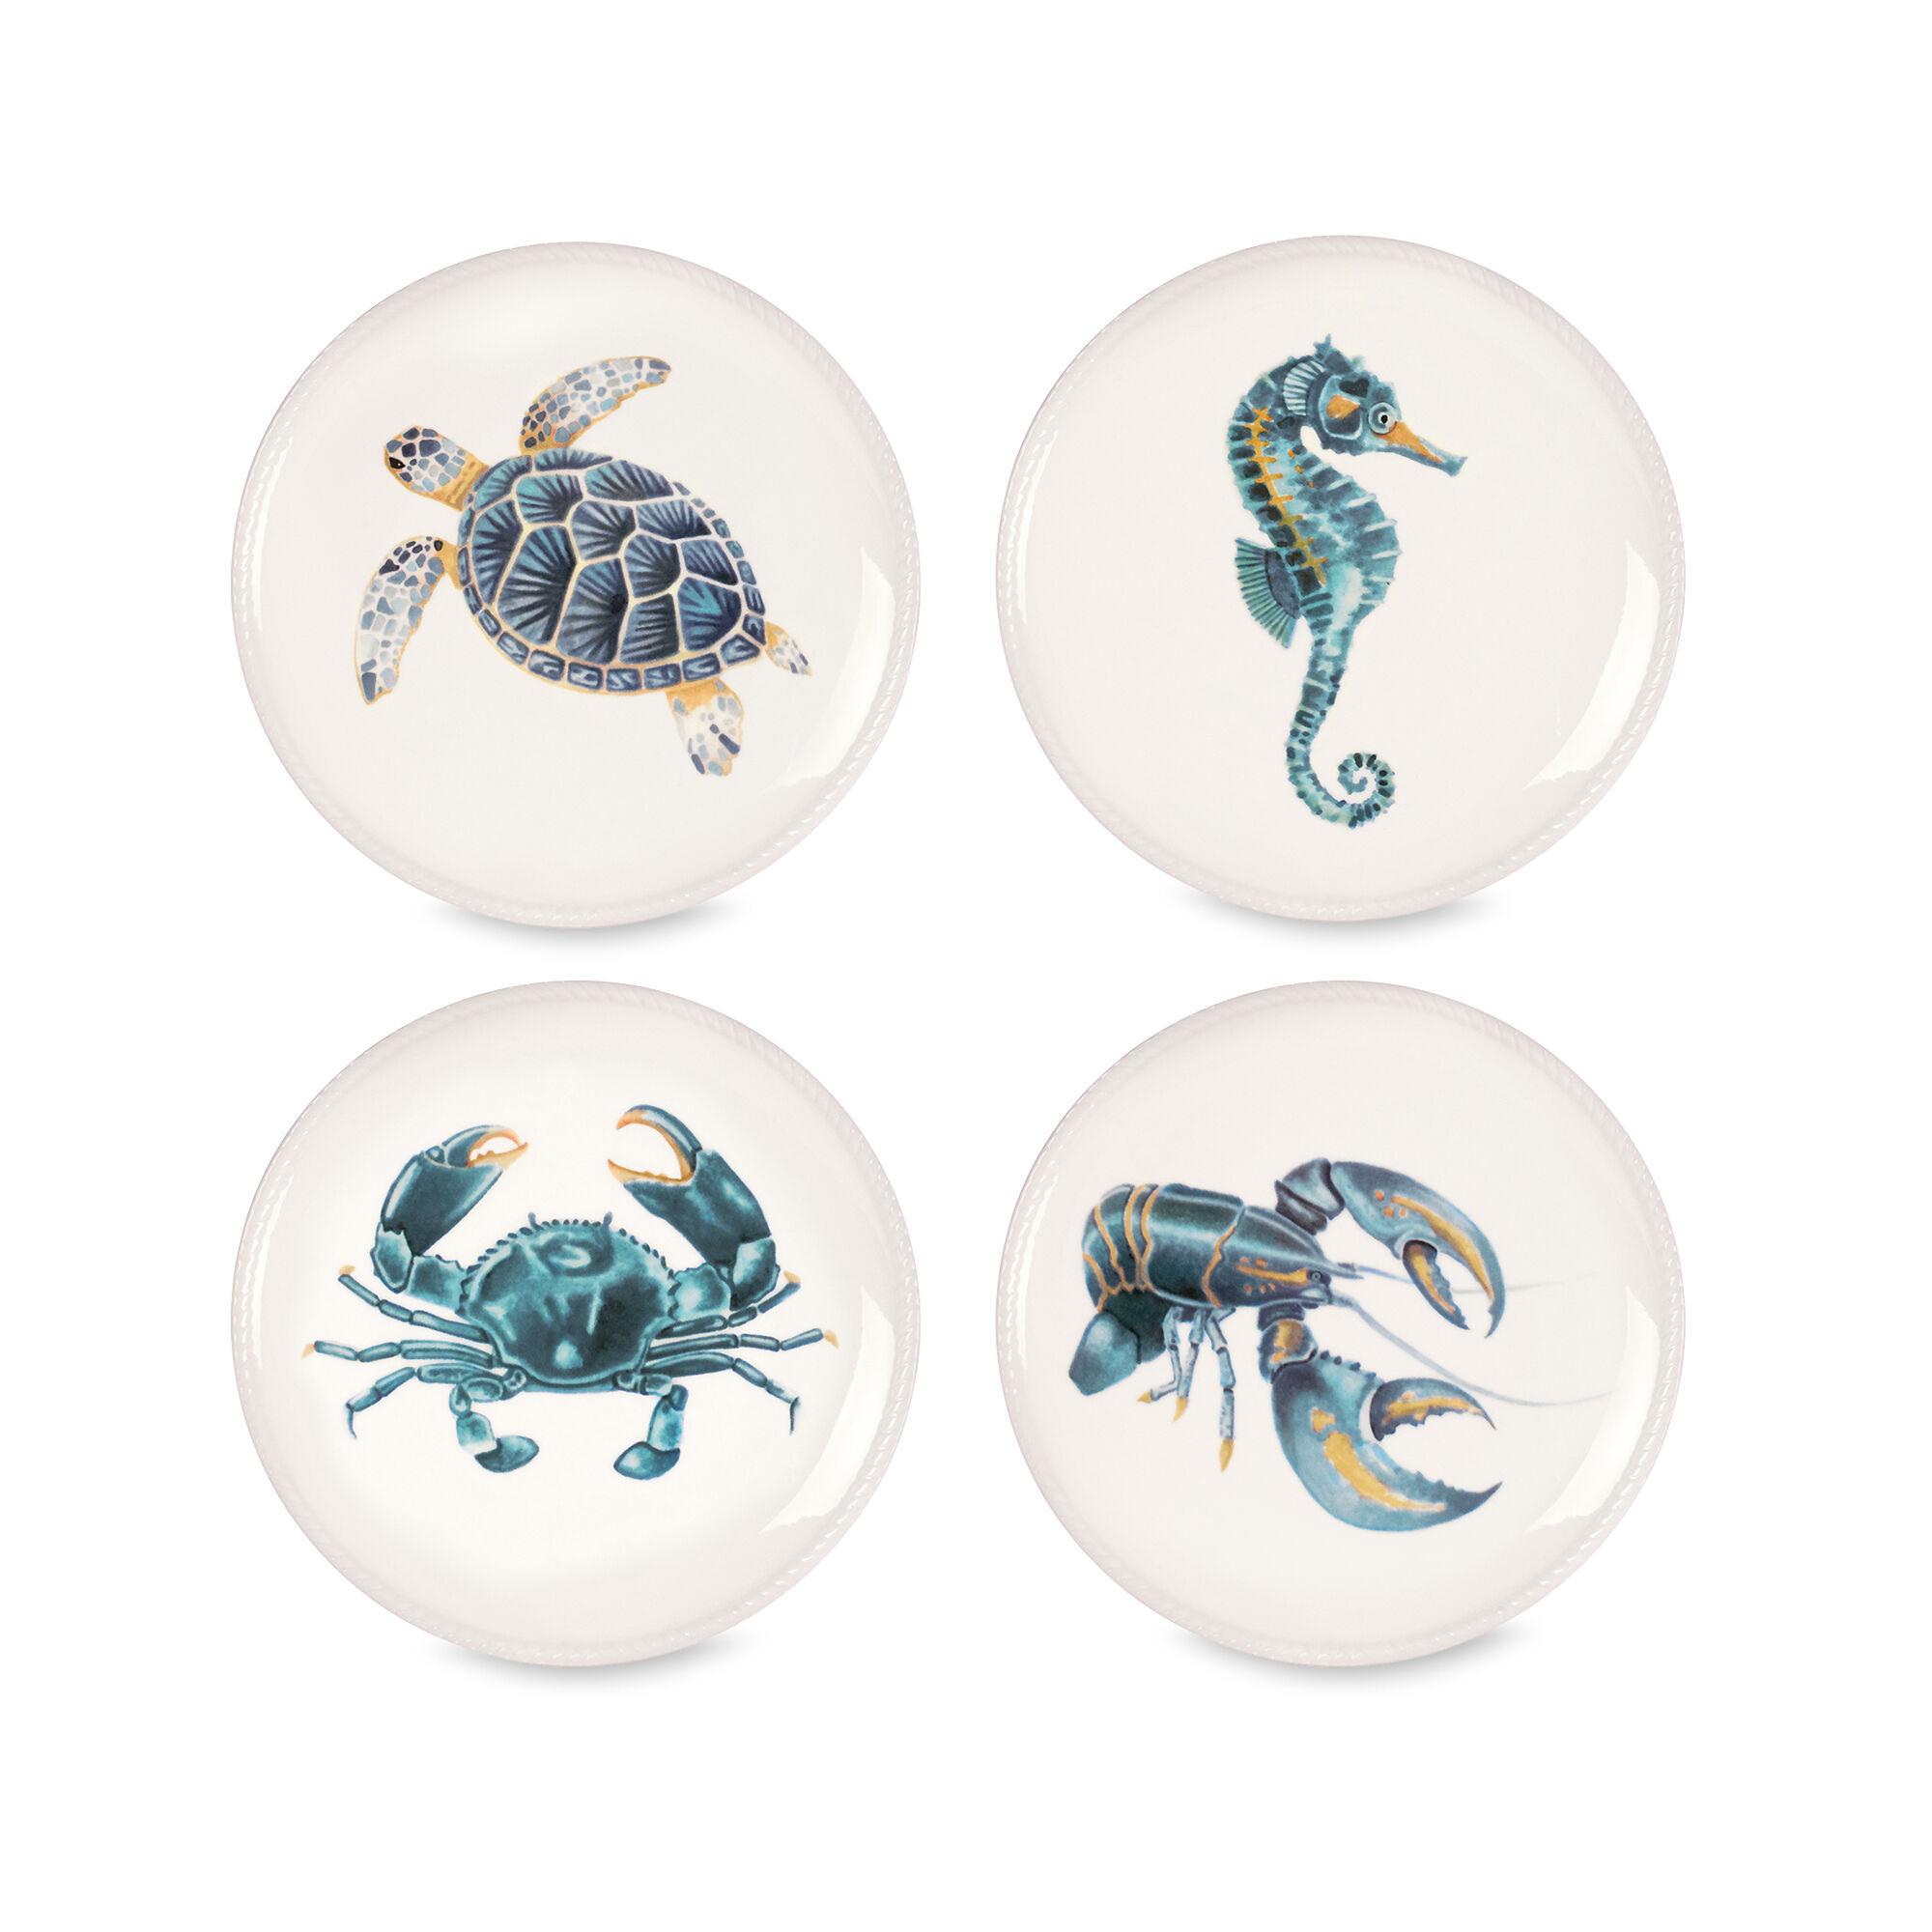 Fitz and Floyd \u0026quot;Cape Coral\u0026quot; Porcelain Plates   default  sc 1 st  Ross-Simons & Fitz and Floyd \